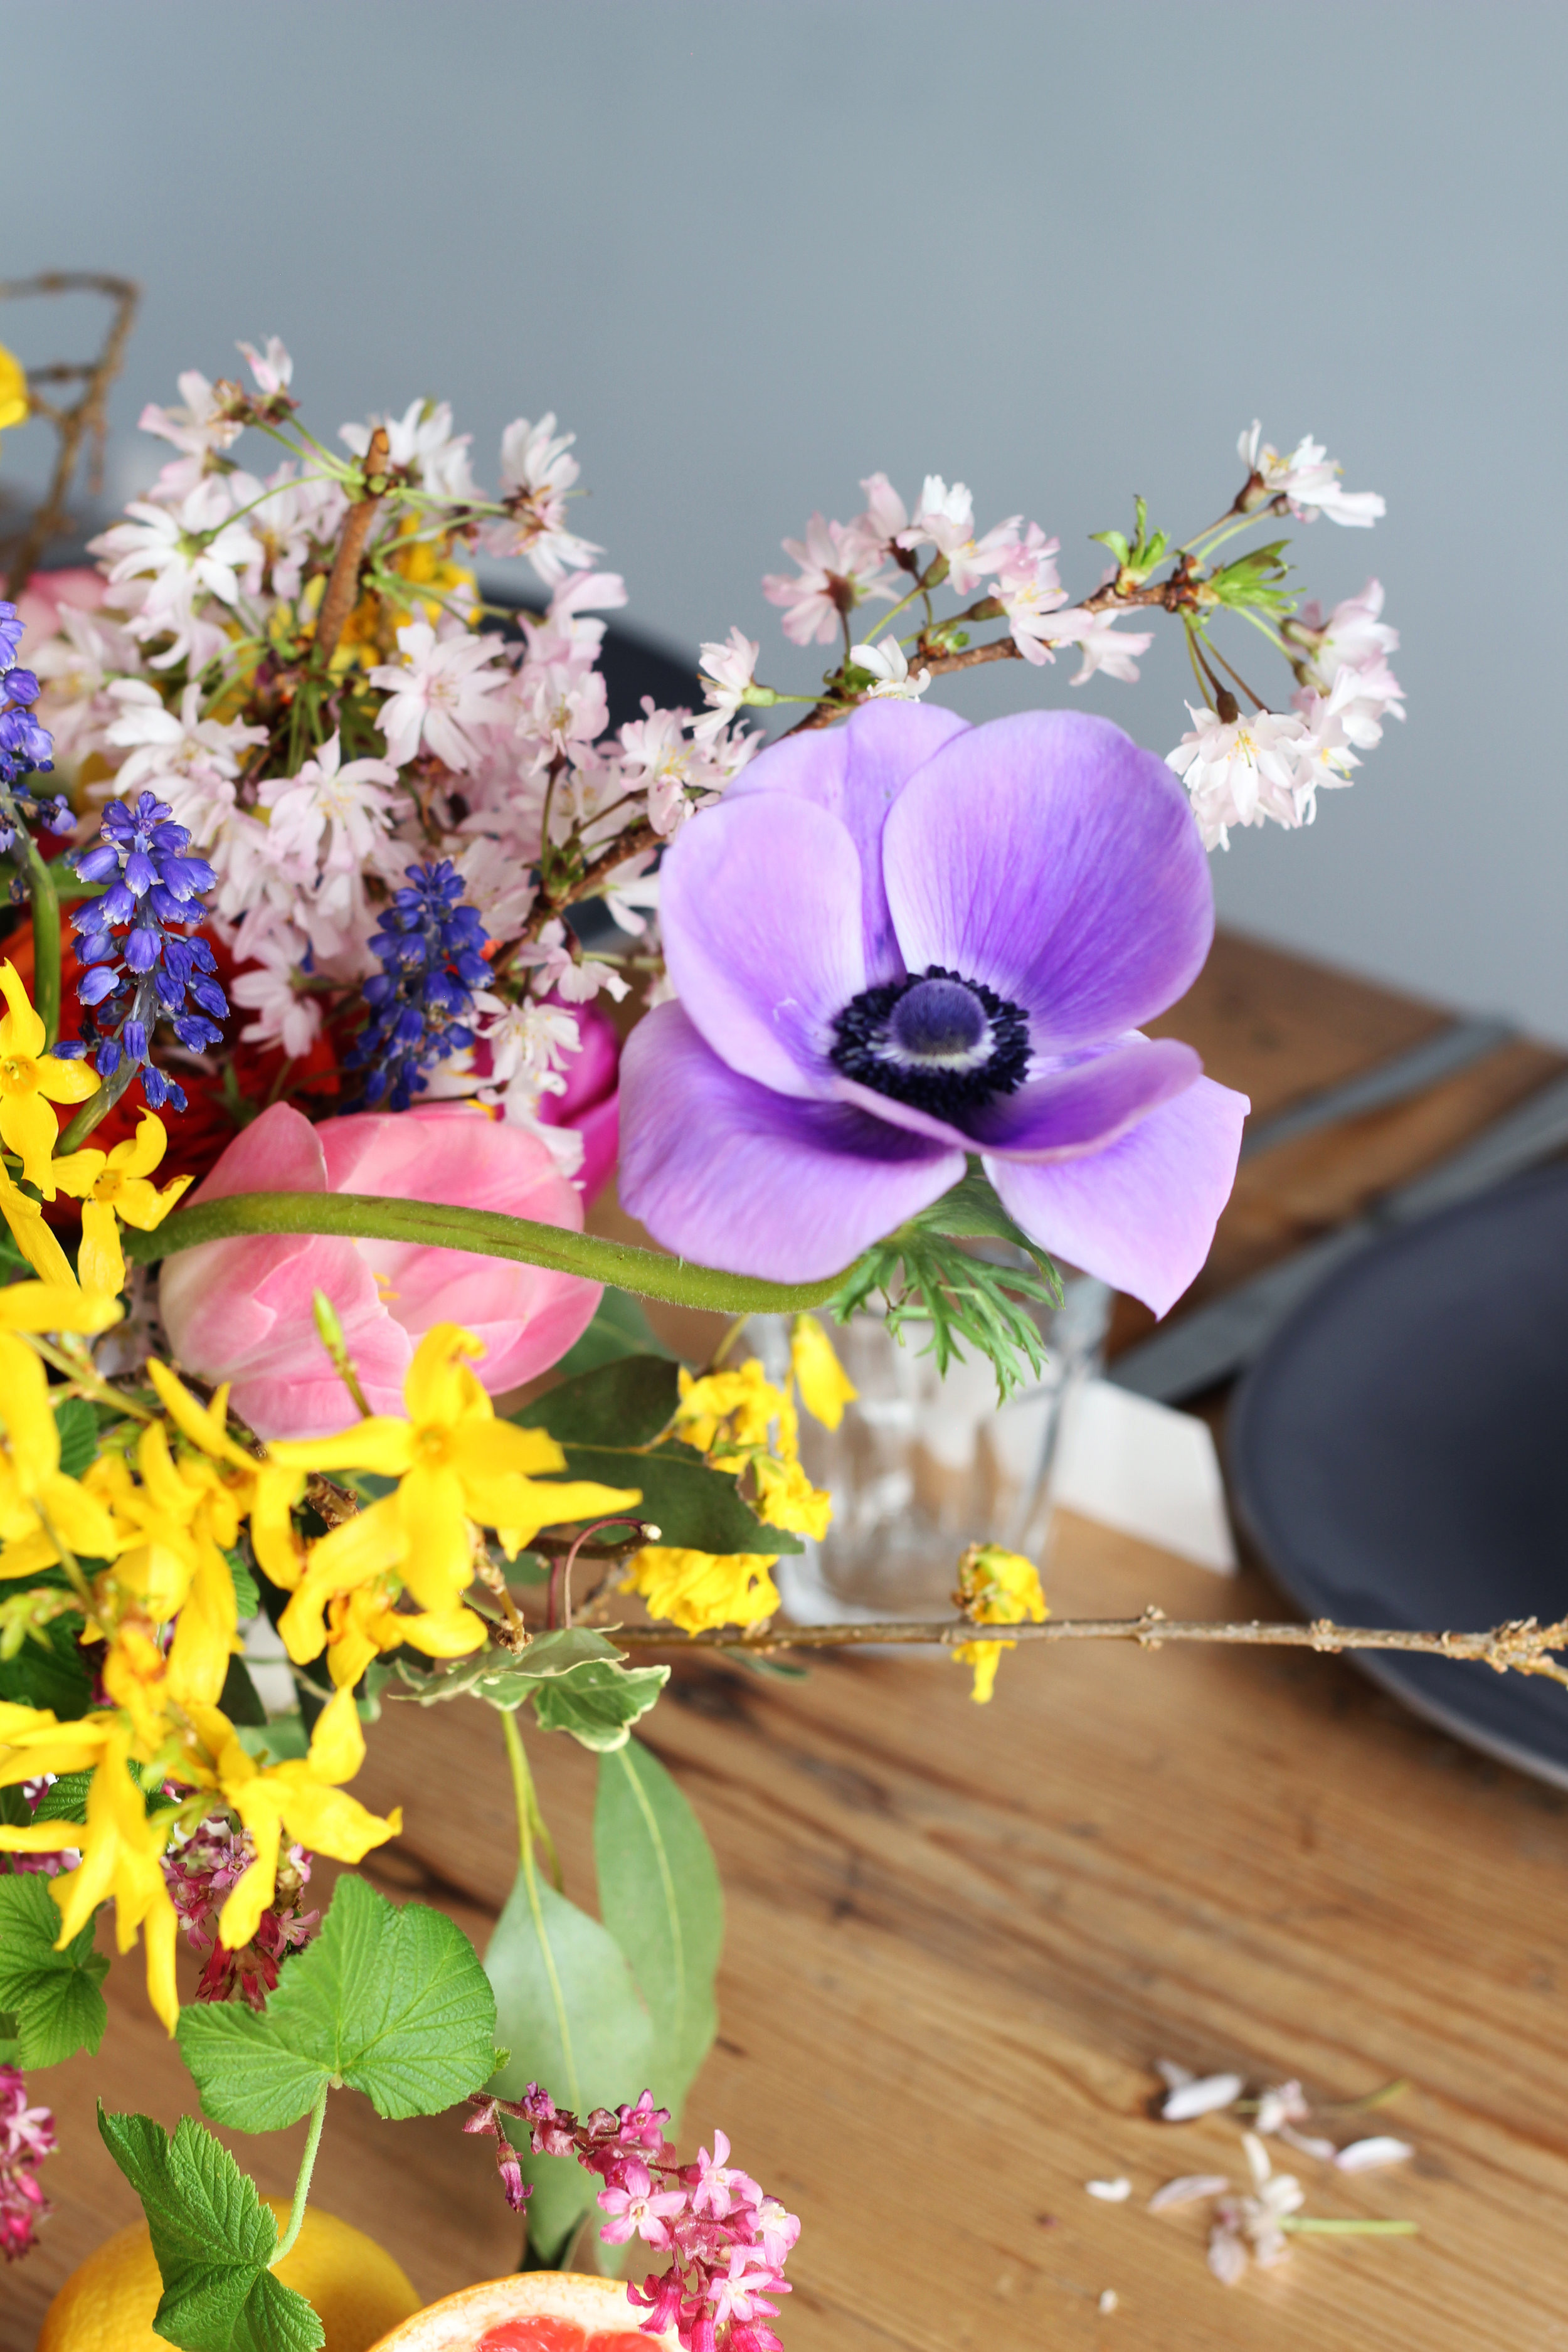 Callie-Pettigrew-Fruity-Florals-3.jpg